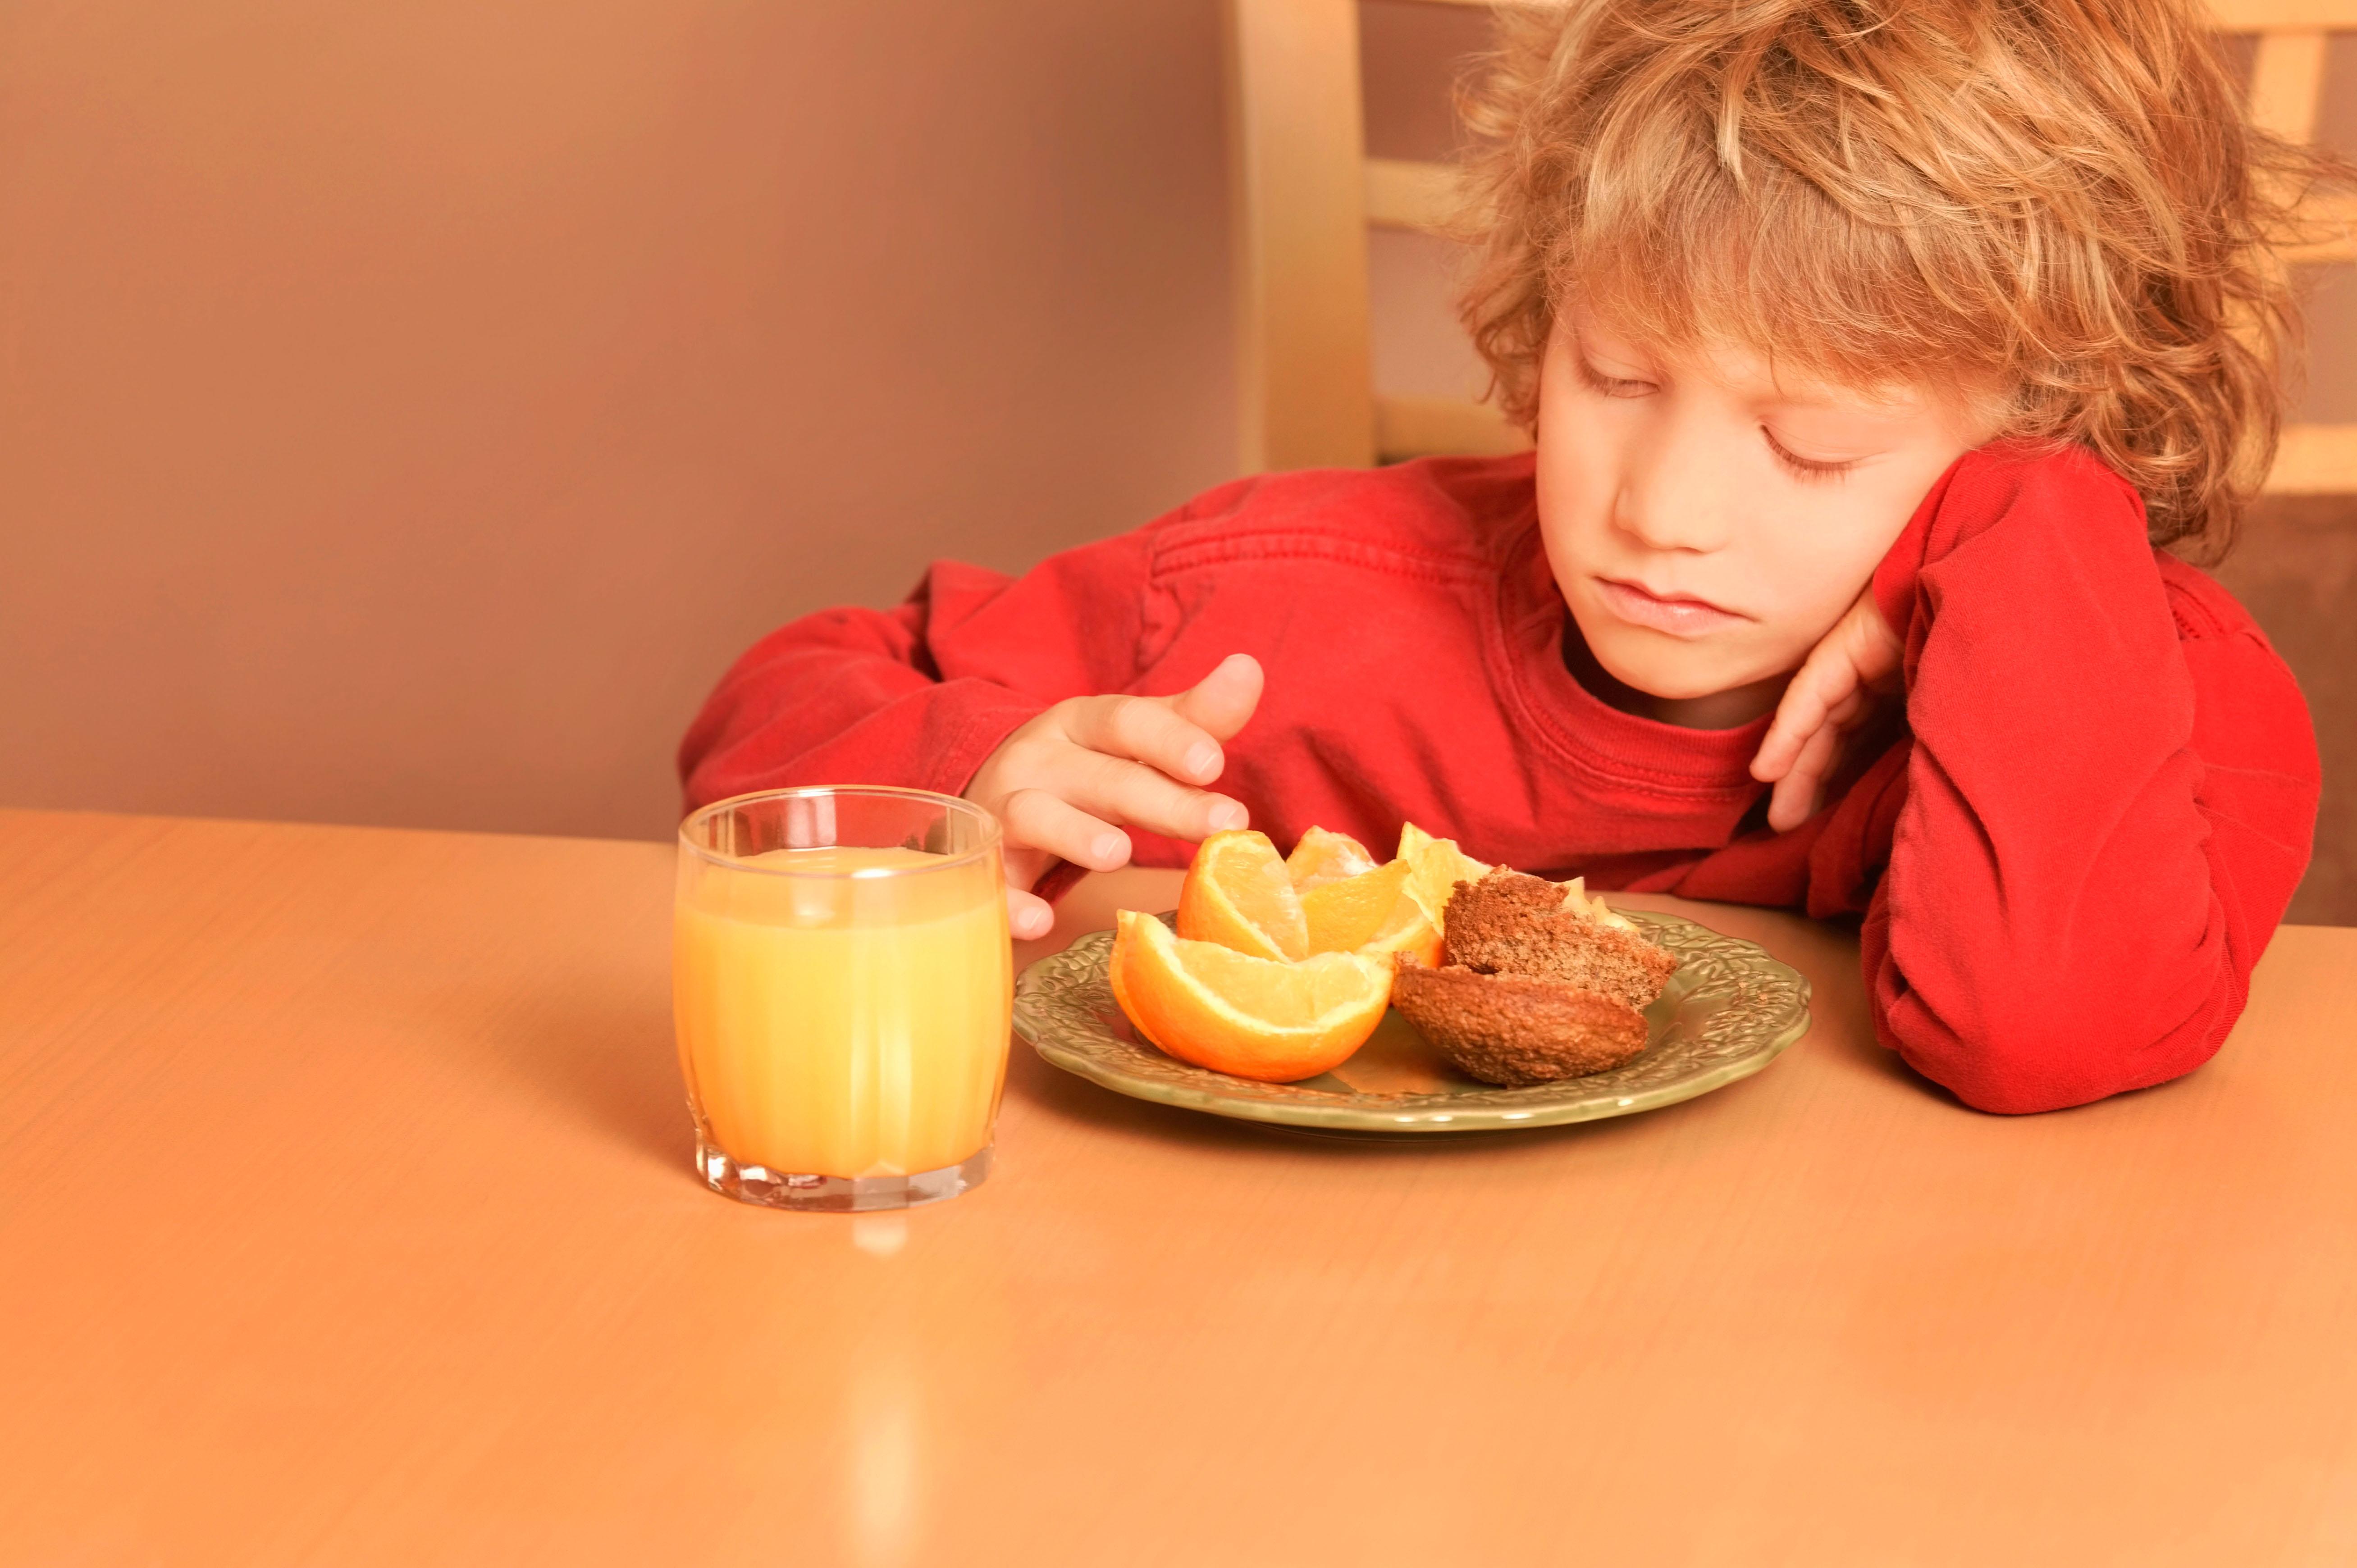 Bambini: rifiuto del cibo